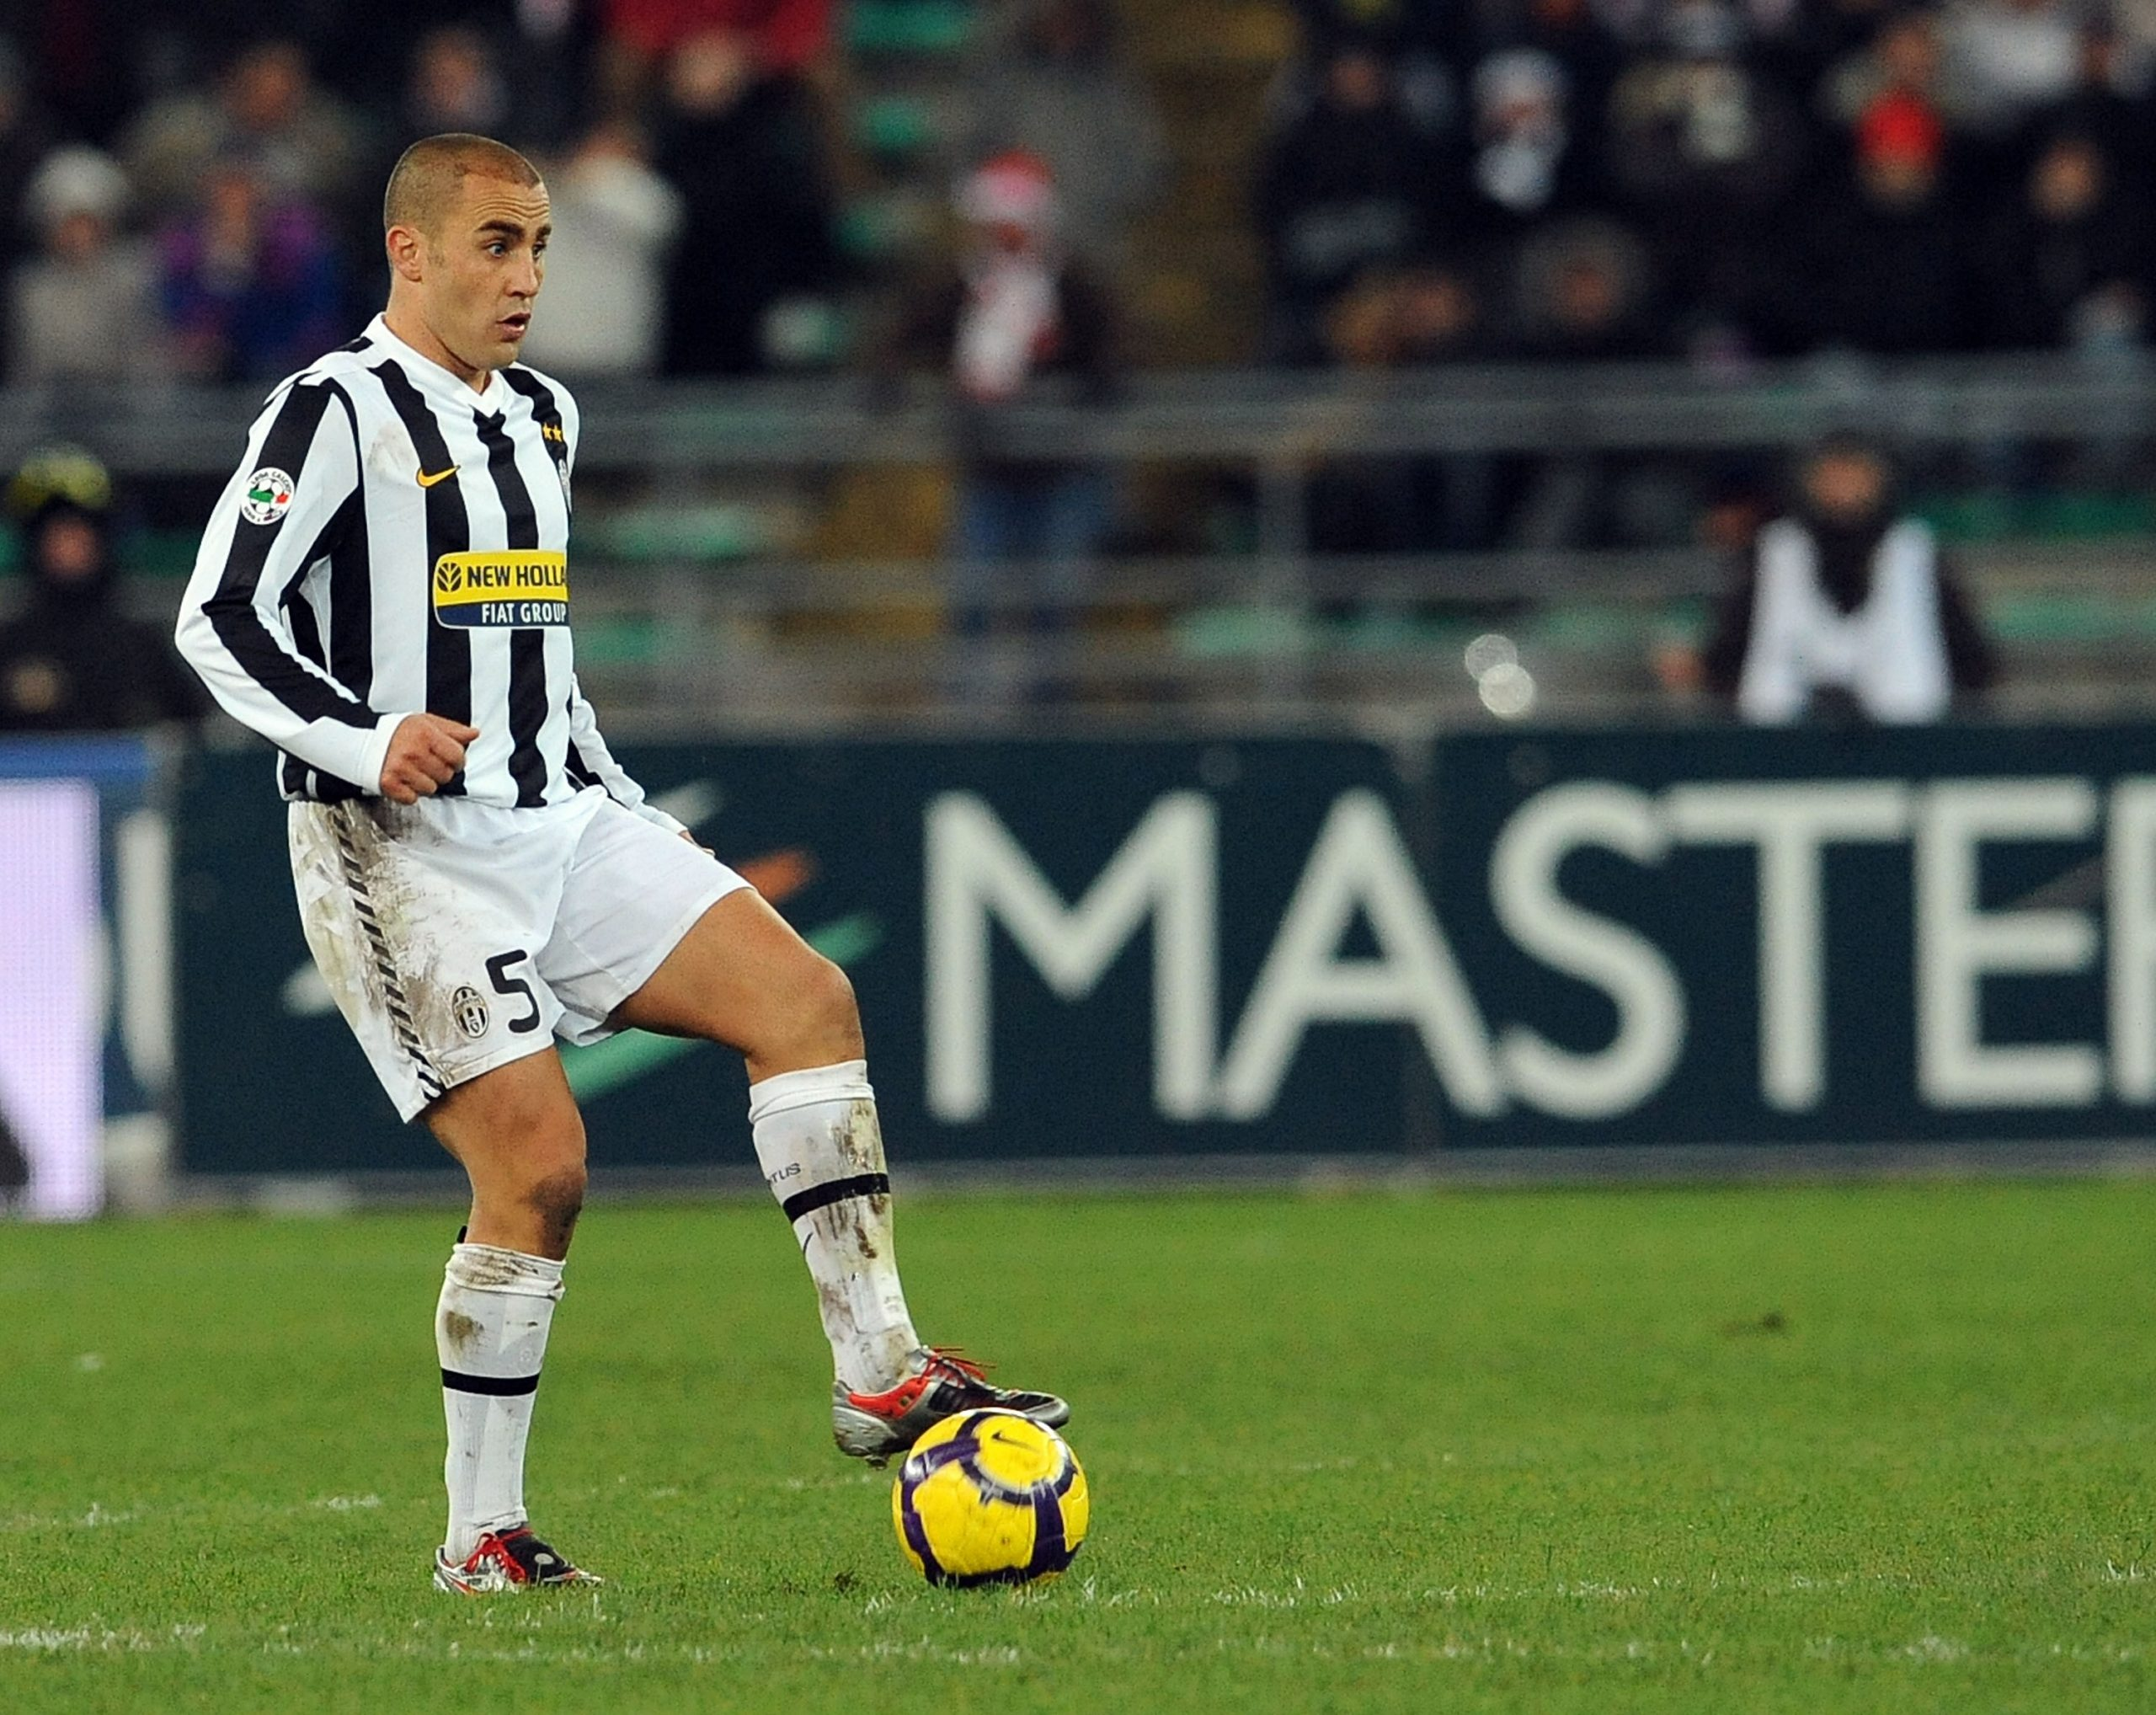 Cannavaro: 'Titles won on the pitch' -Juvefc.com